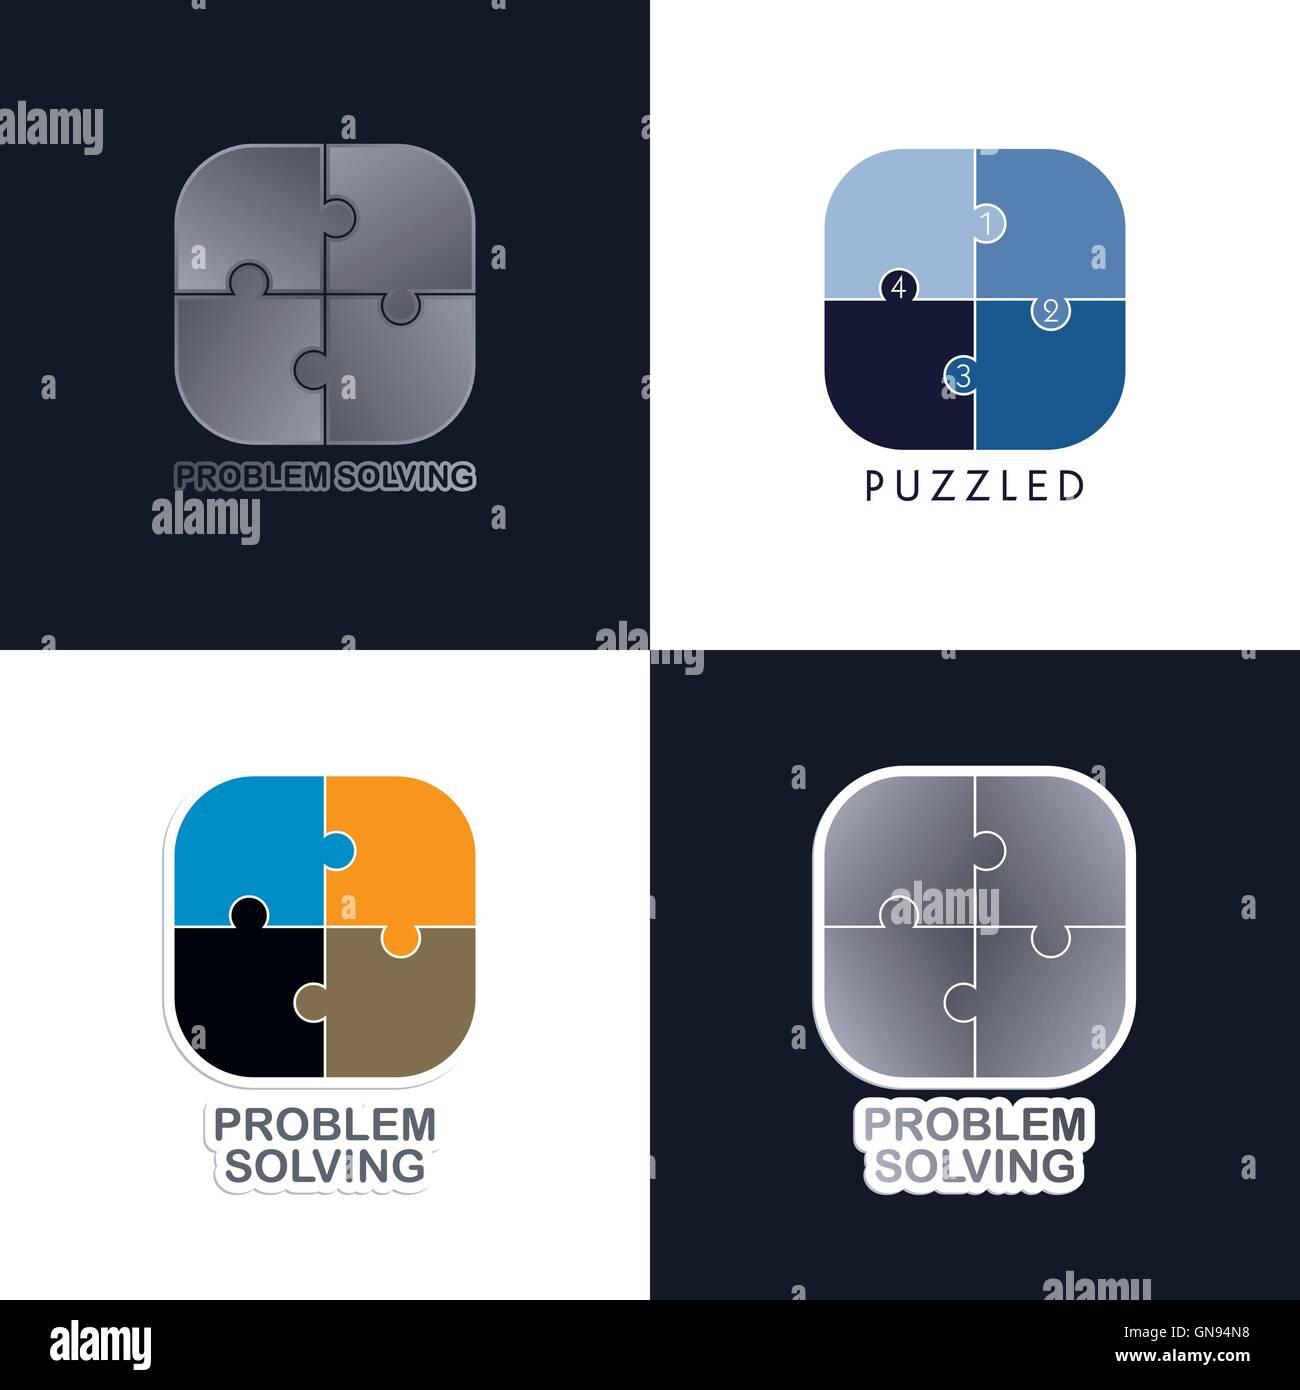 problem solving - Stock Image